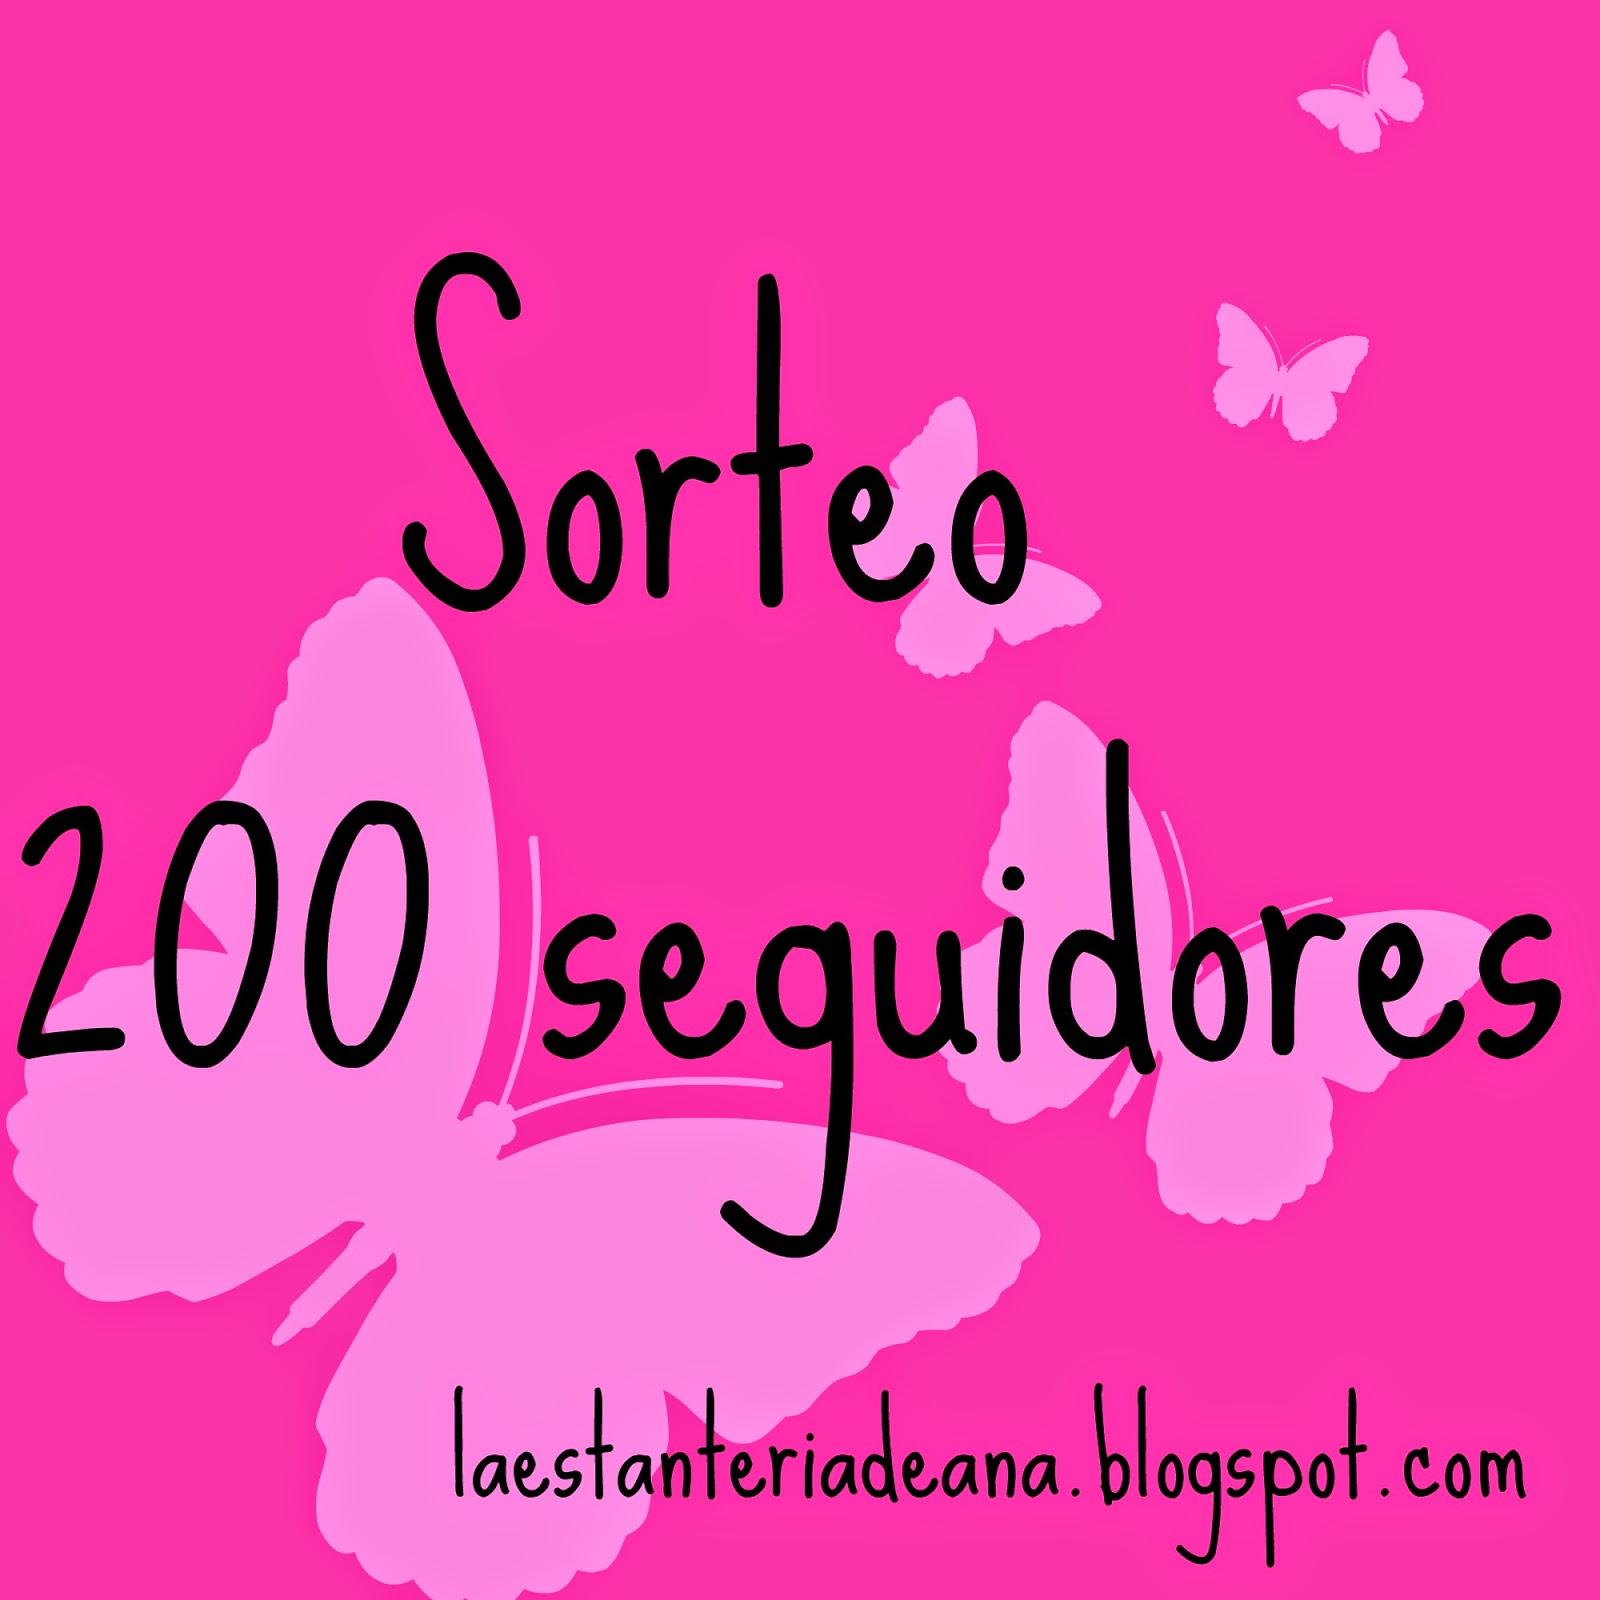 http://laestanteriadeana.blogspot.com.es/2014/10/sorteo-200-seguidores.html?showComment=1415629502509#c7576598206089134452